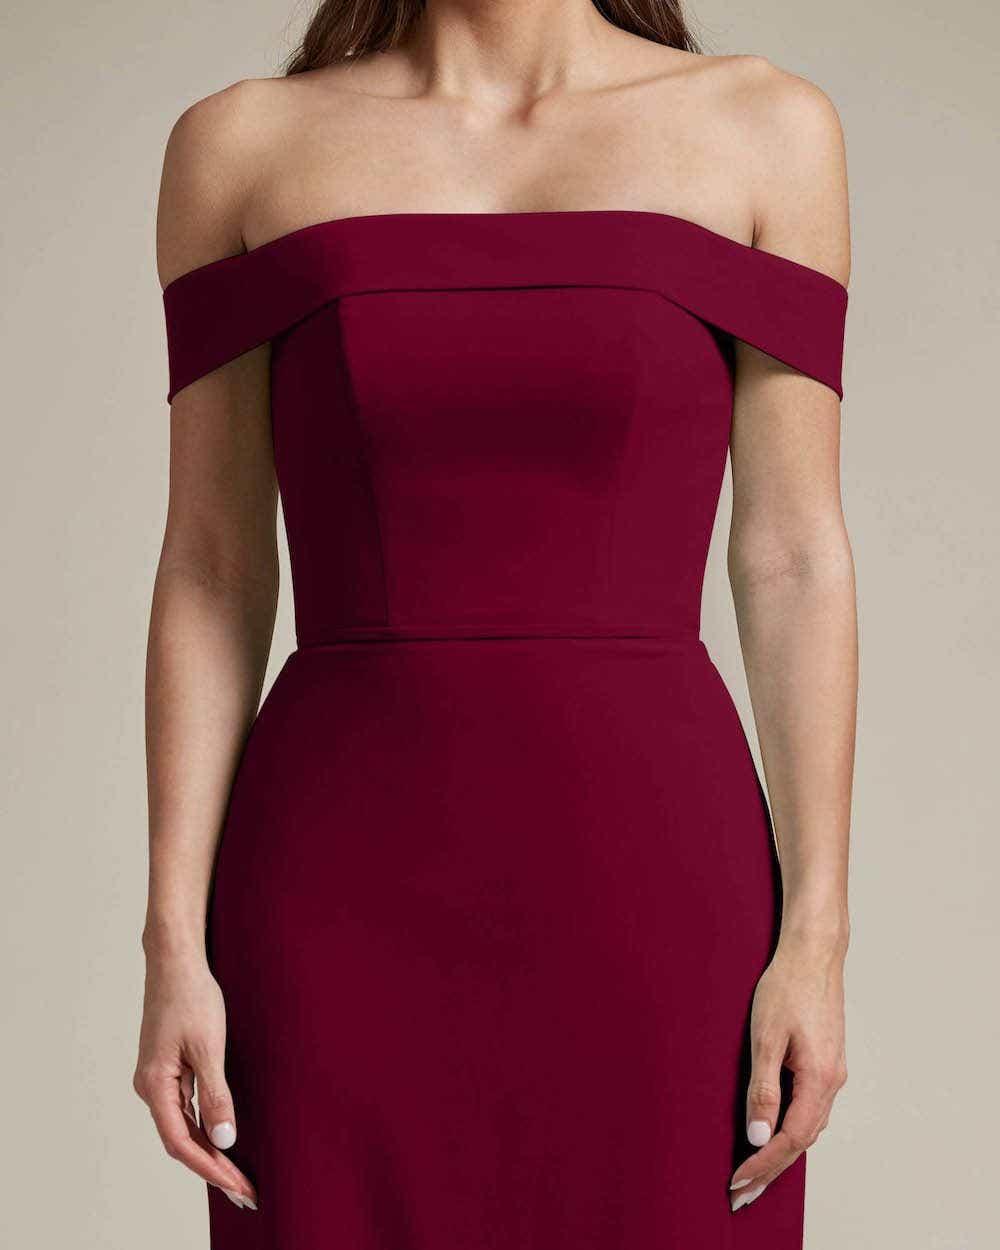 Over The Shoulder Classic Princess Maxi Dress - Detail